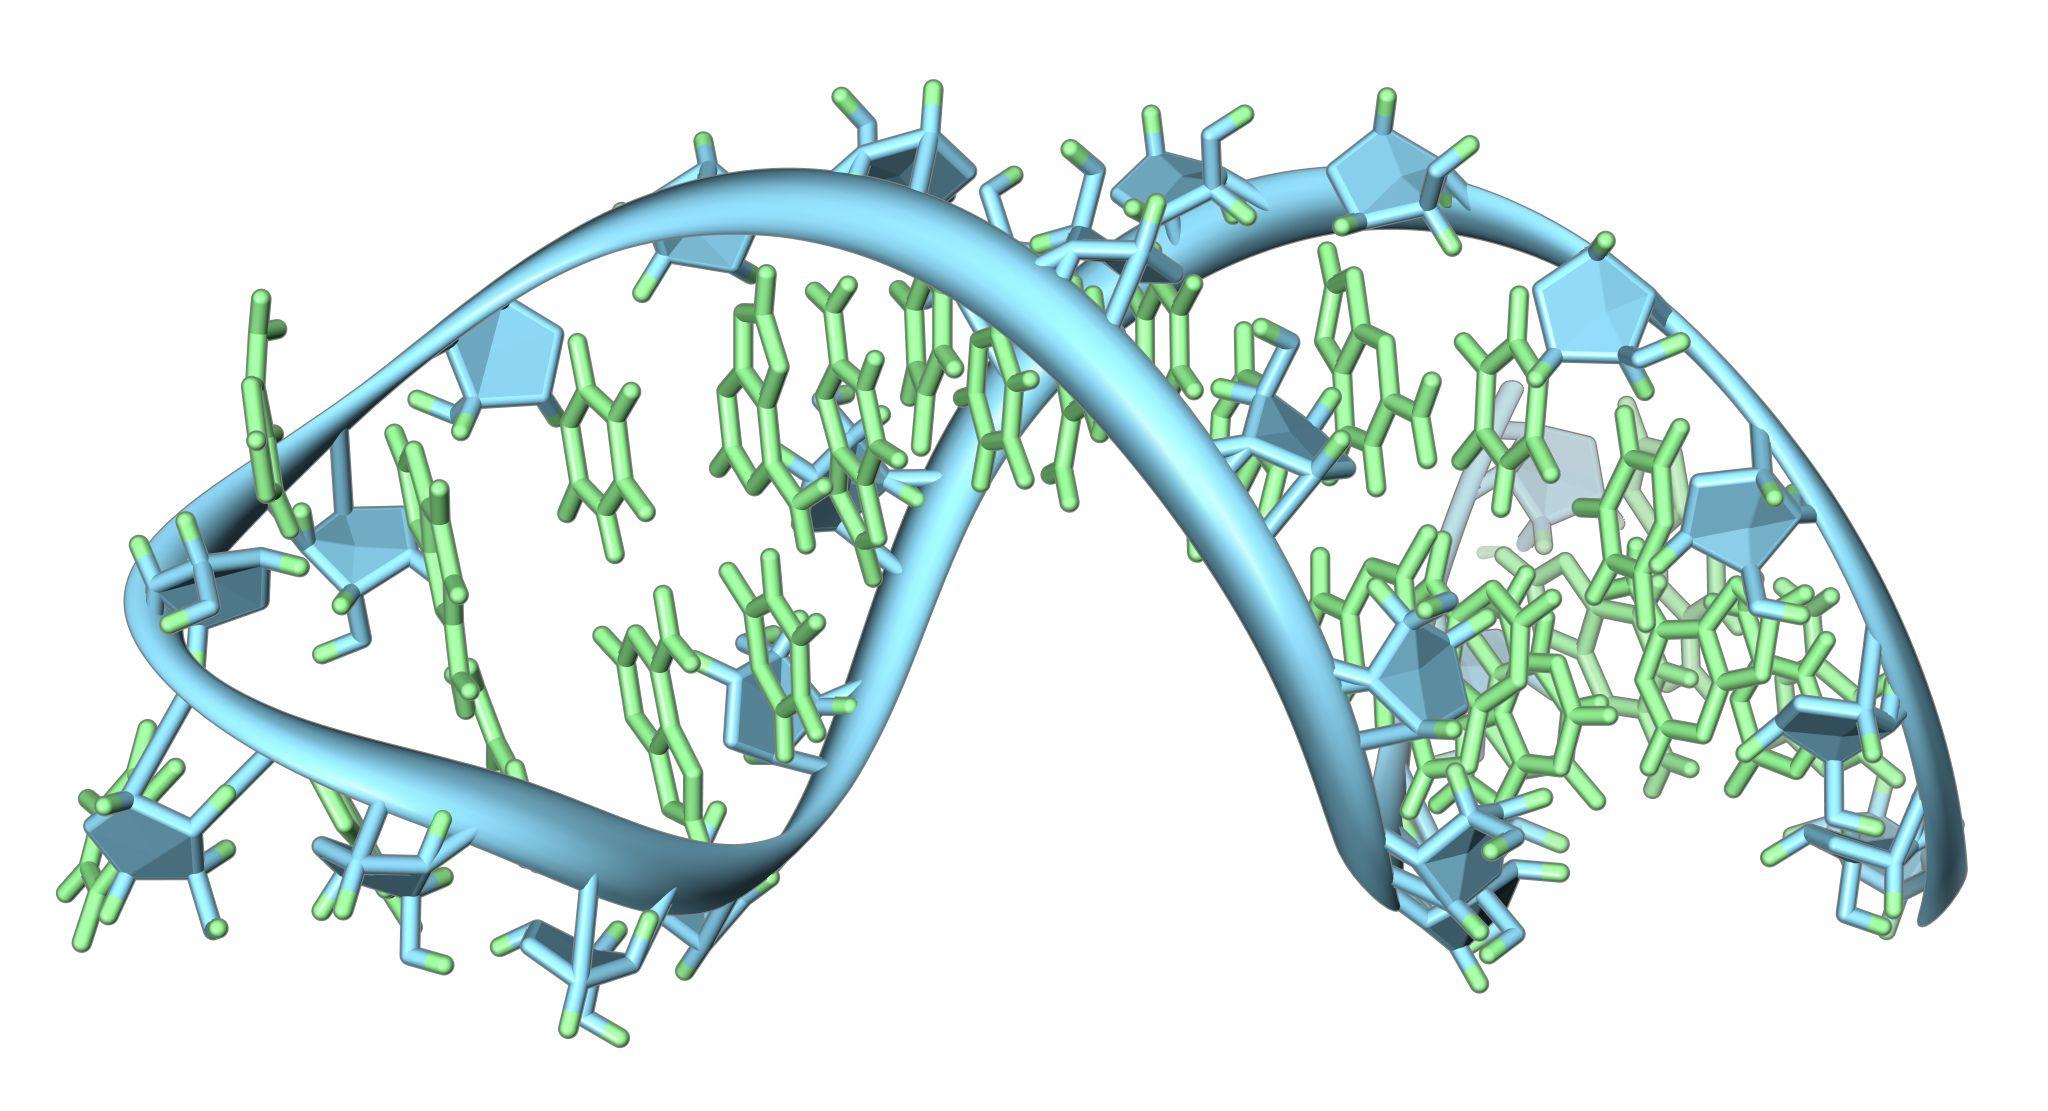 CRISPR used to edit RNA